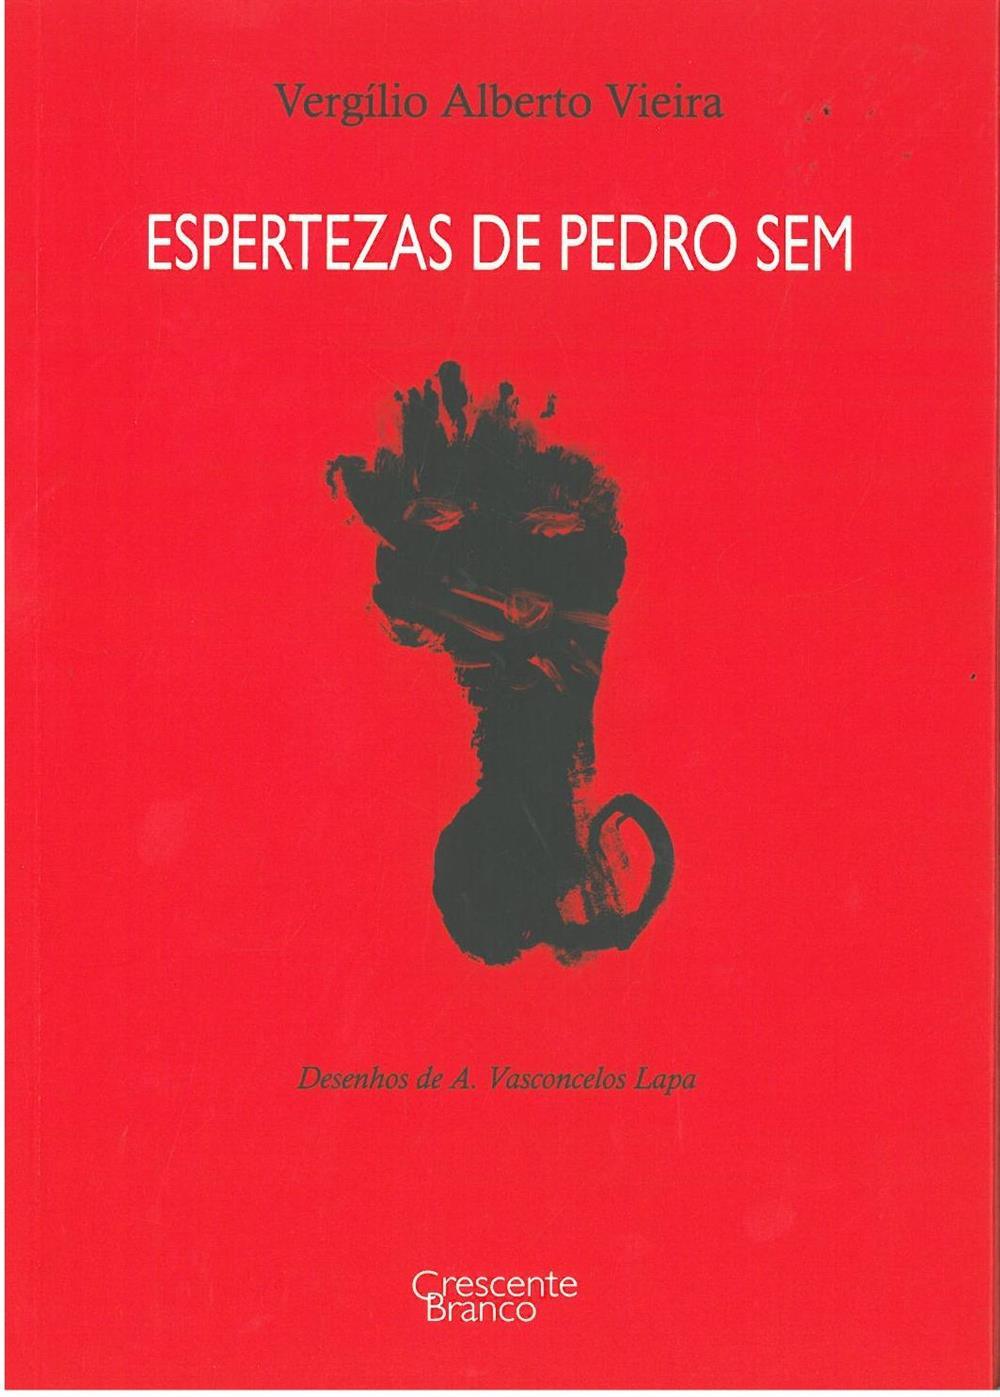 Espertezas Pedro Sem_.jpg